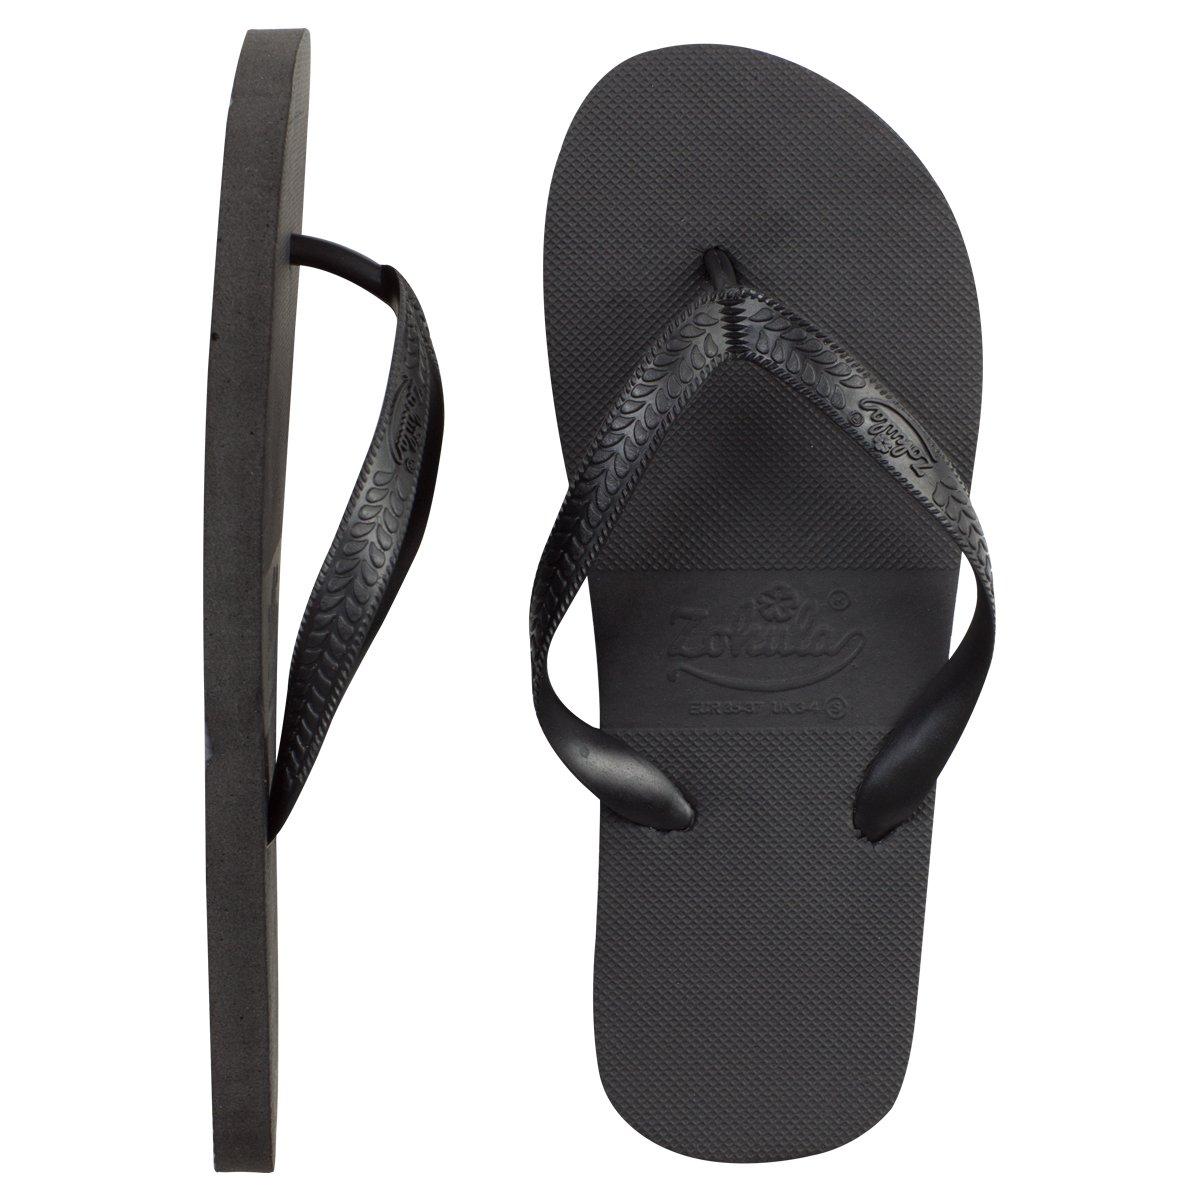 d40a5eacde1f Zohula Originals Bulk Buy Flip Flops - 50 Pairs   Amazon.co.uk  Shoes   Bags